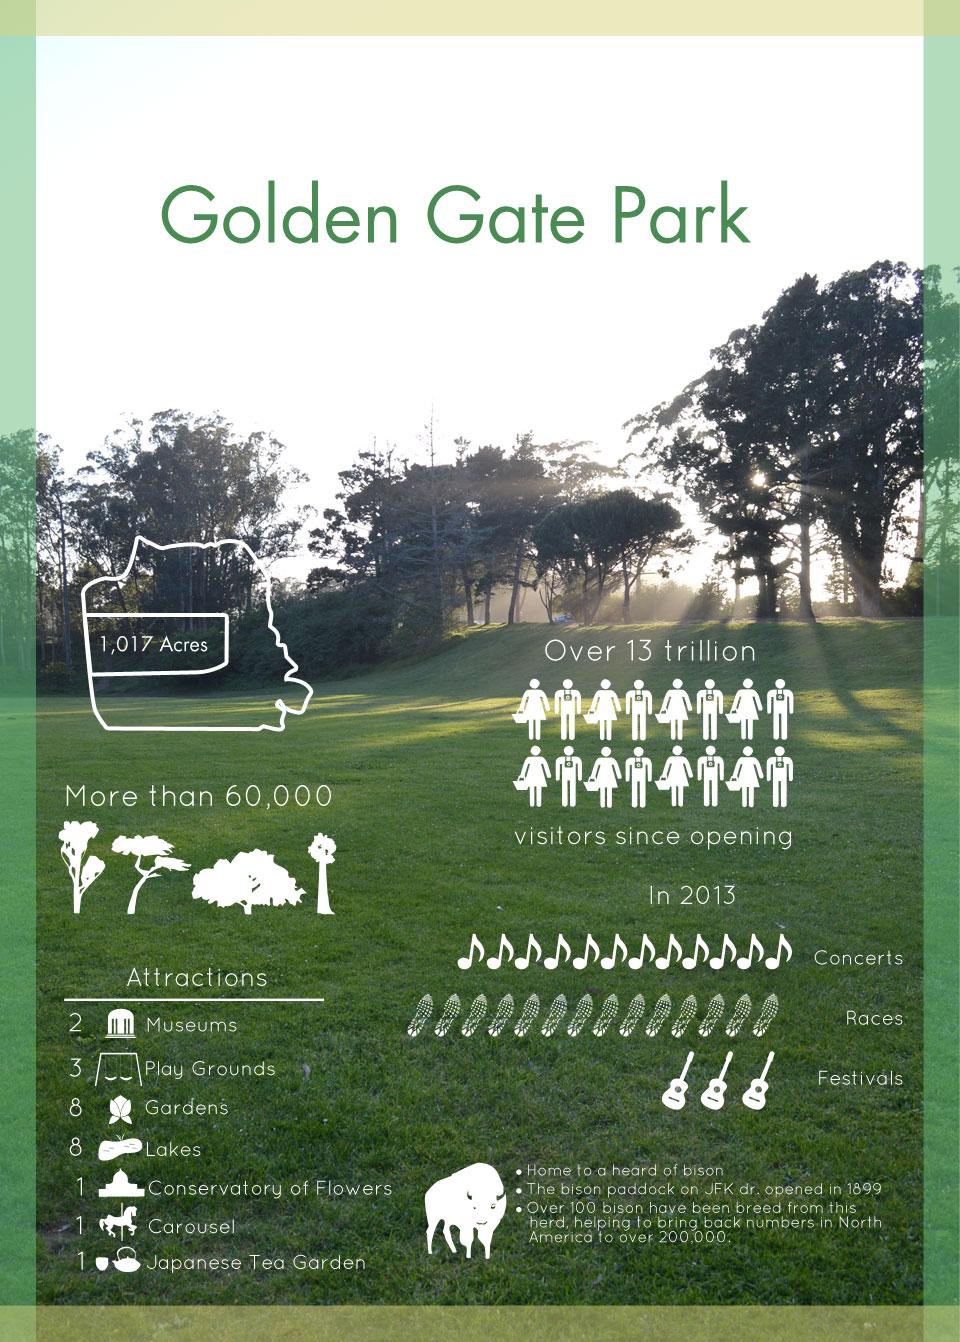 GGP-Infographic3.web.jpg